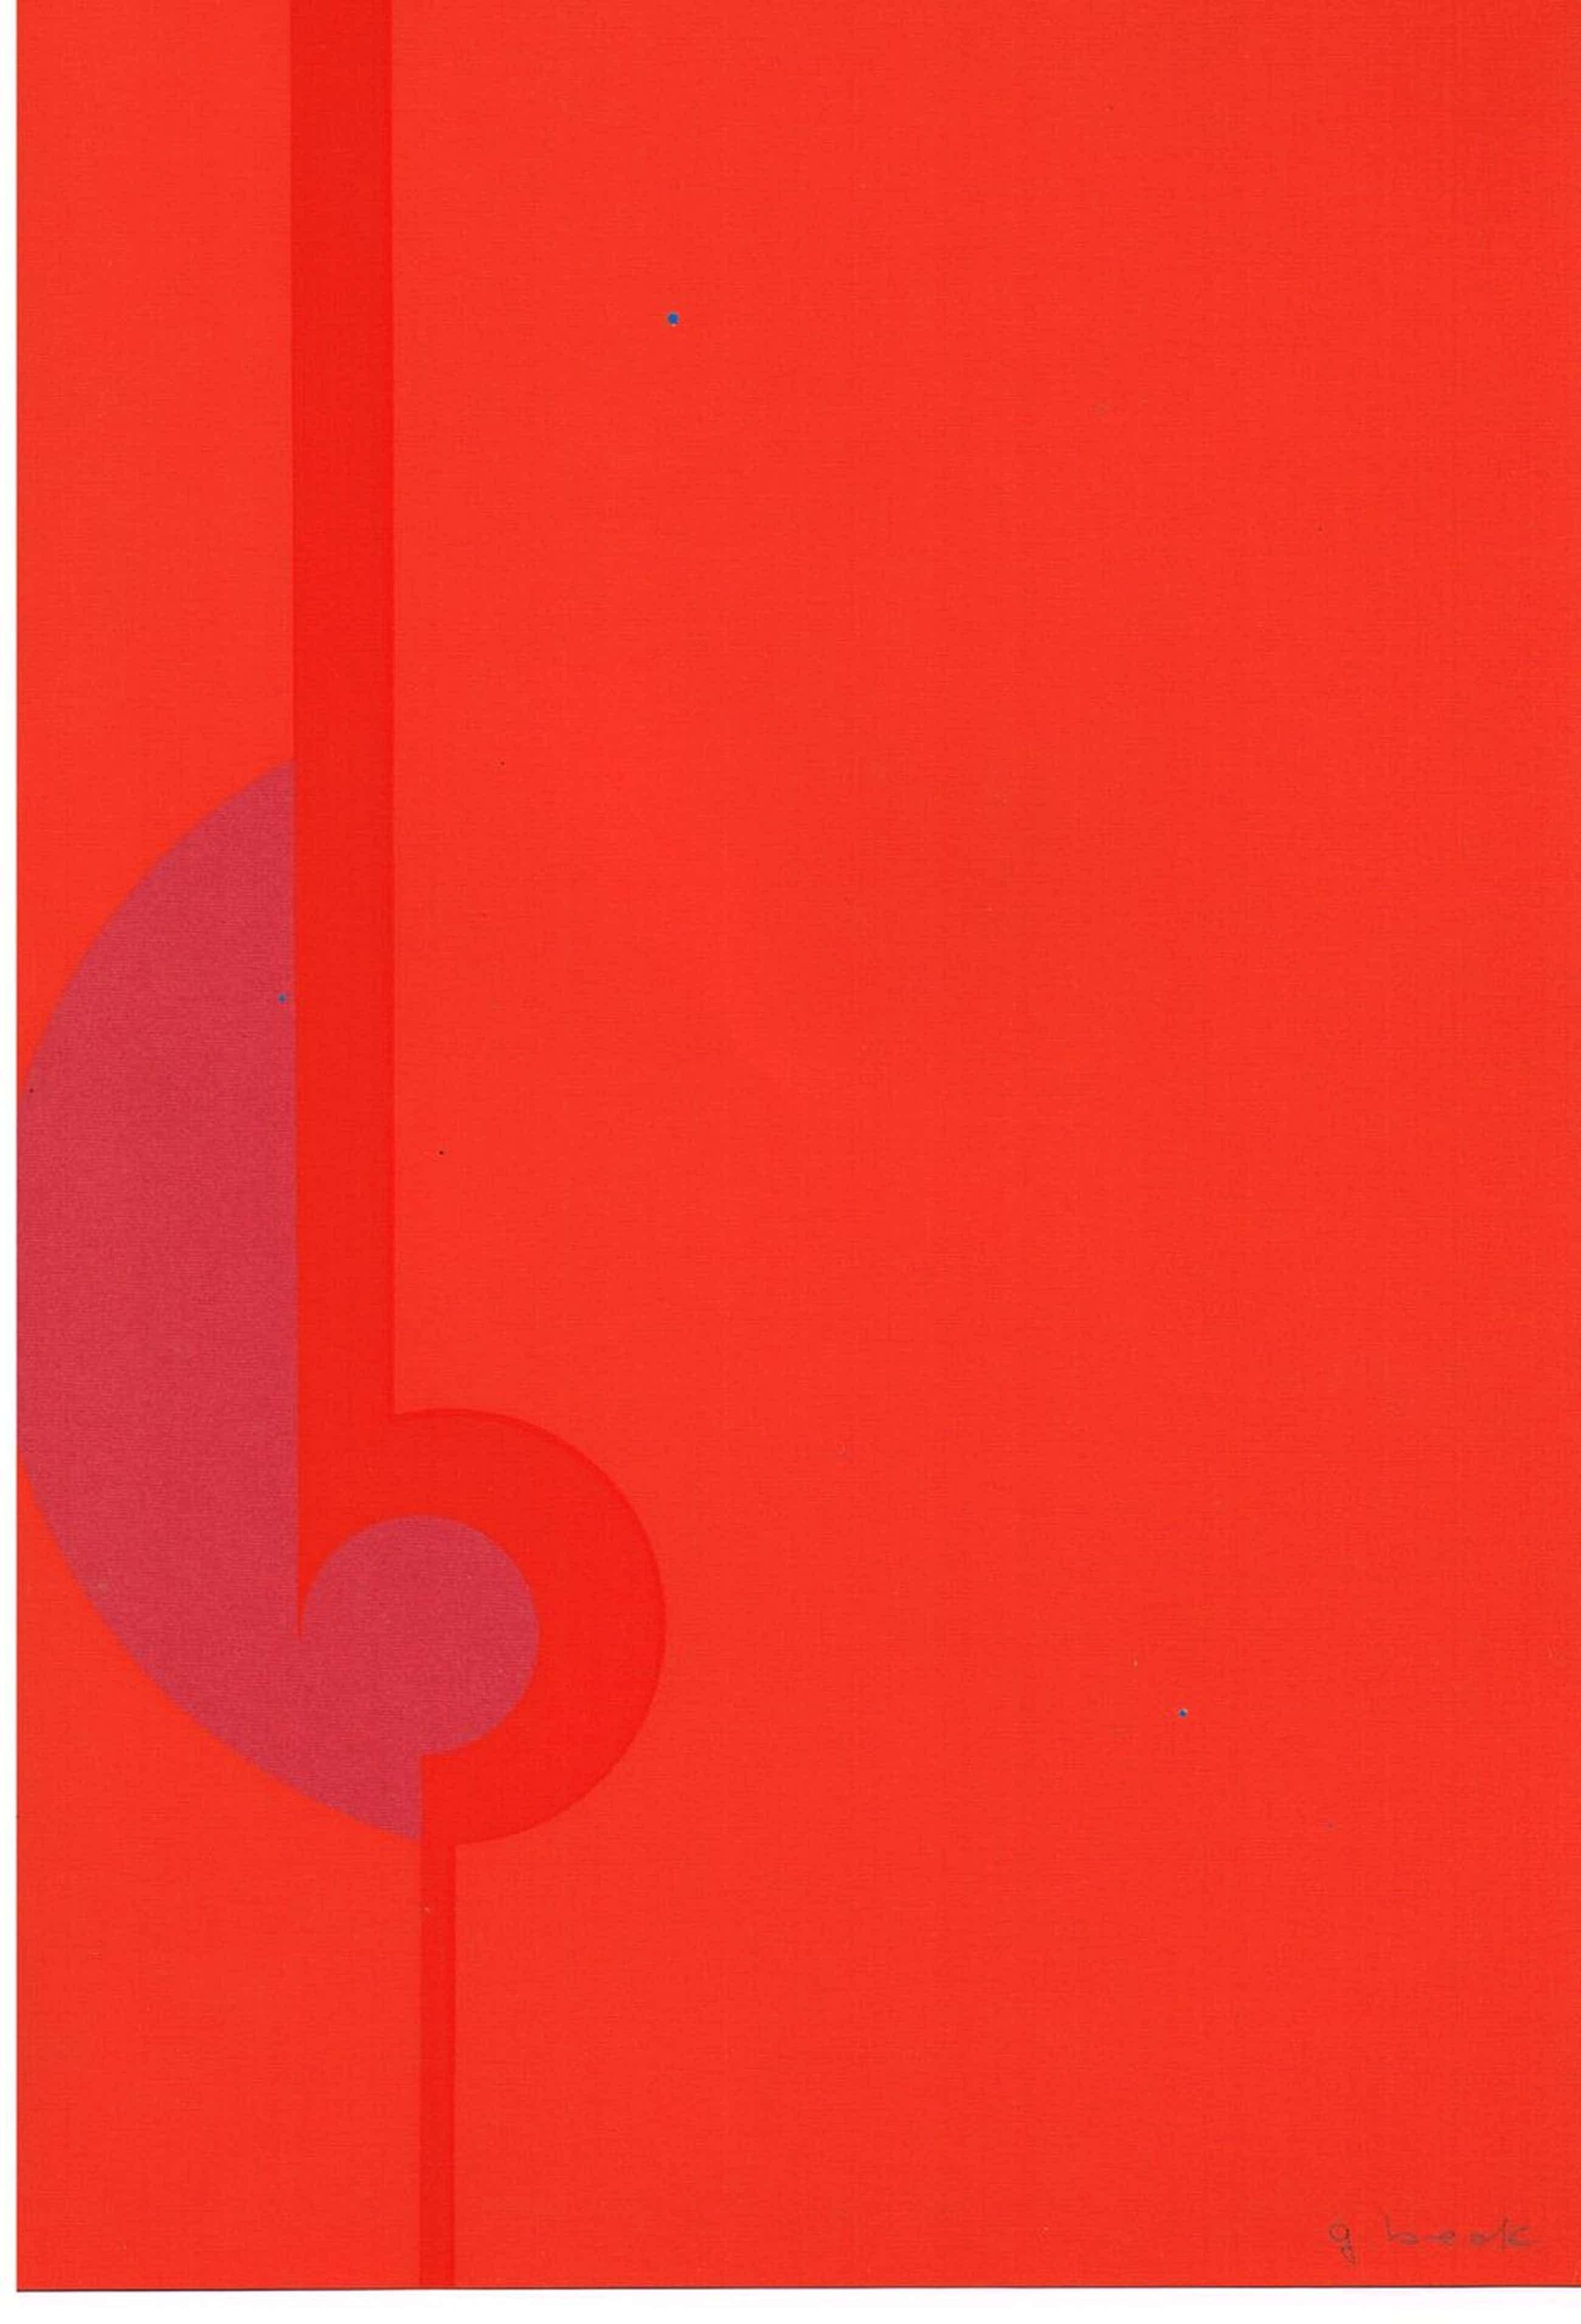 Gerlinde Beck - Serigrafie, 1970 kopen? Bied vanaf 80!